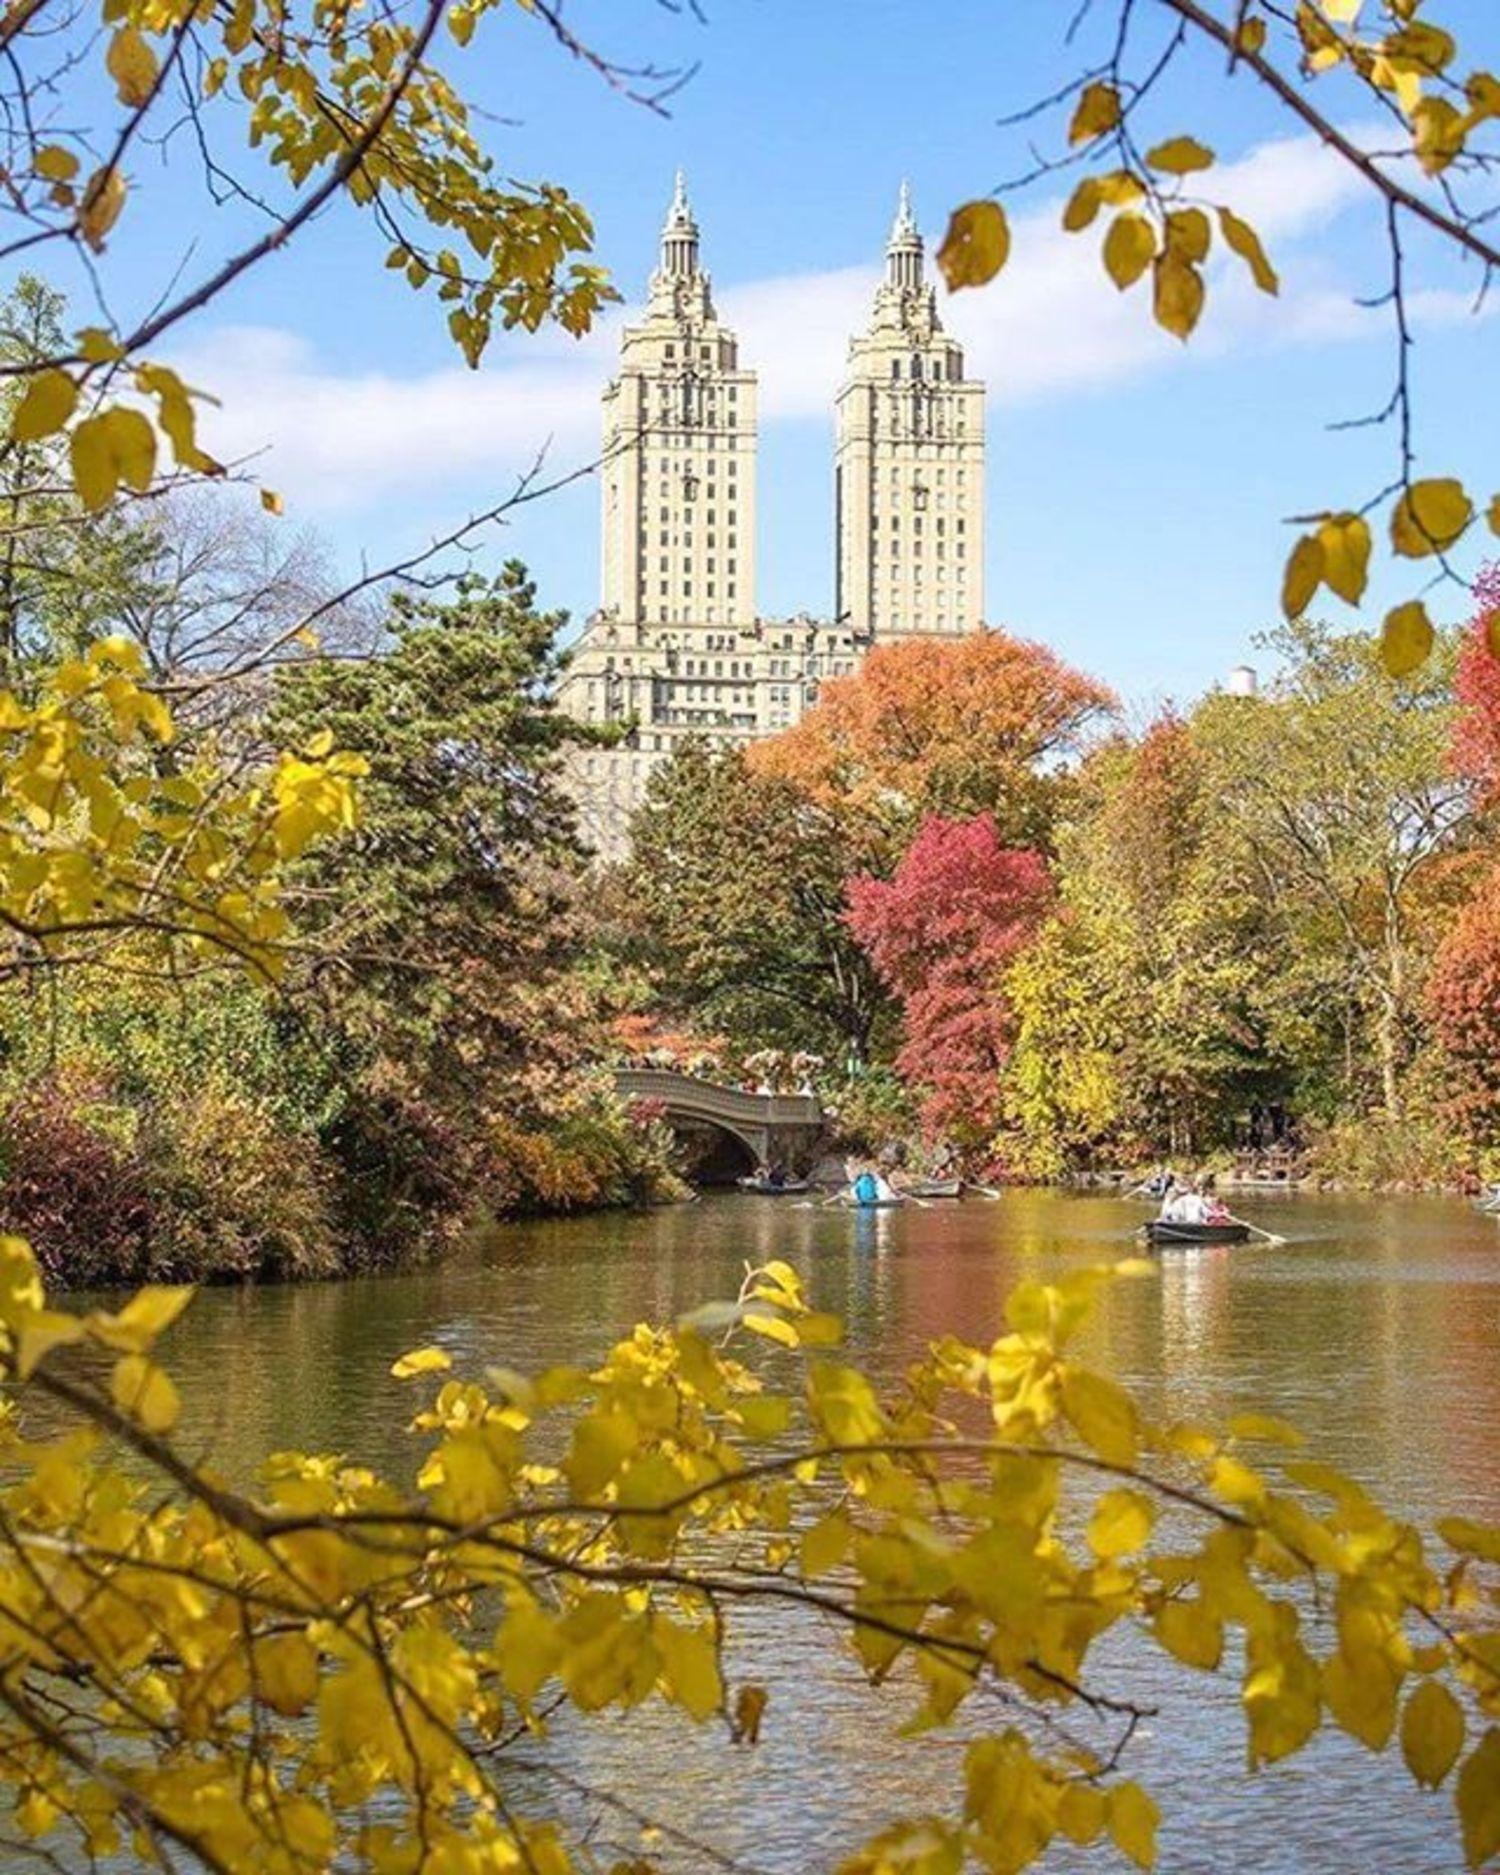 Central Park Lake, New York. Photo via @newyorkcitykopp #newyorkcity #newyork #nyc #viewingnyc